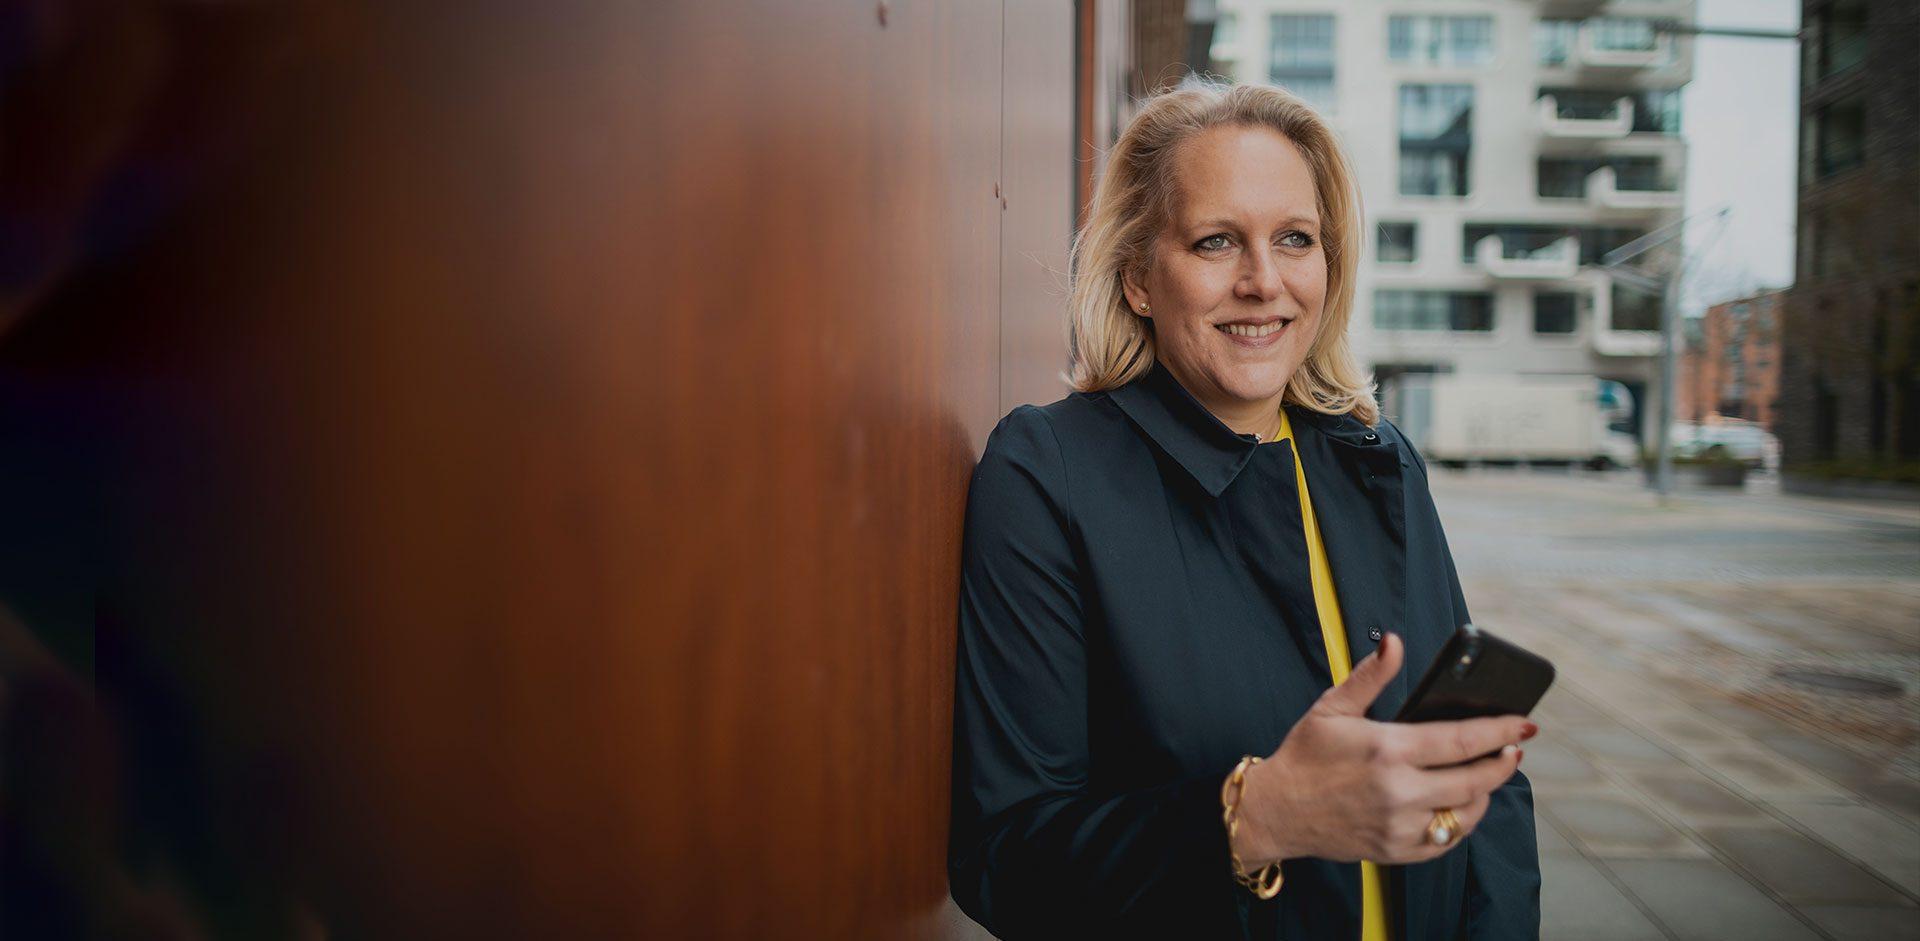 Andrea Pöhl-Jensen – Ihr Private-Coach in Hamburg, Kiel und auf Mallorca - Image